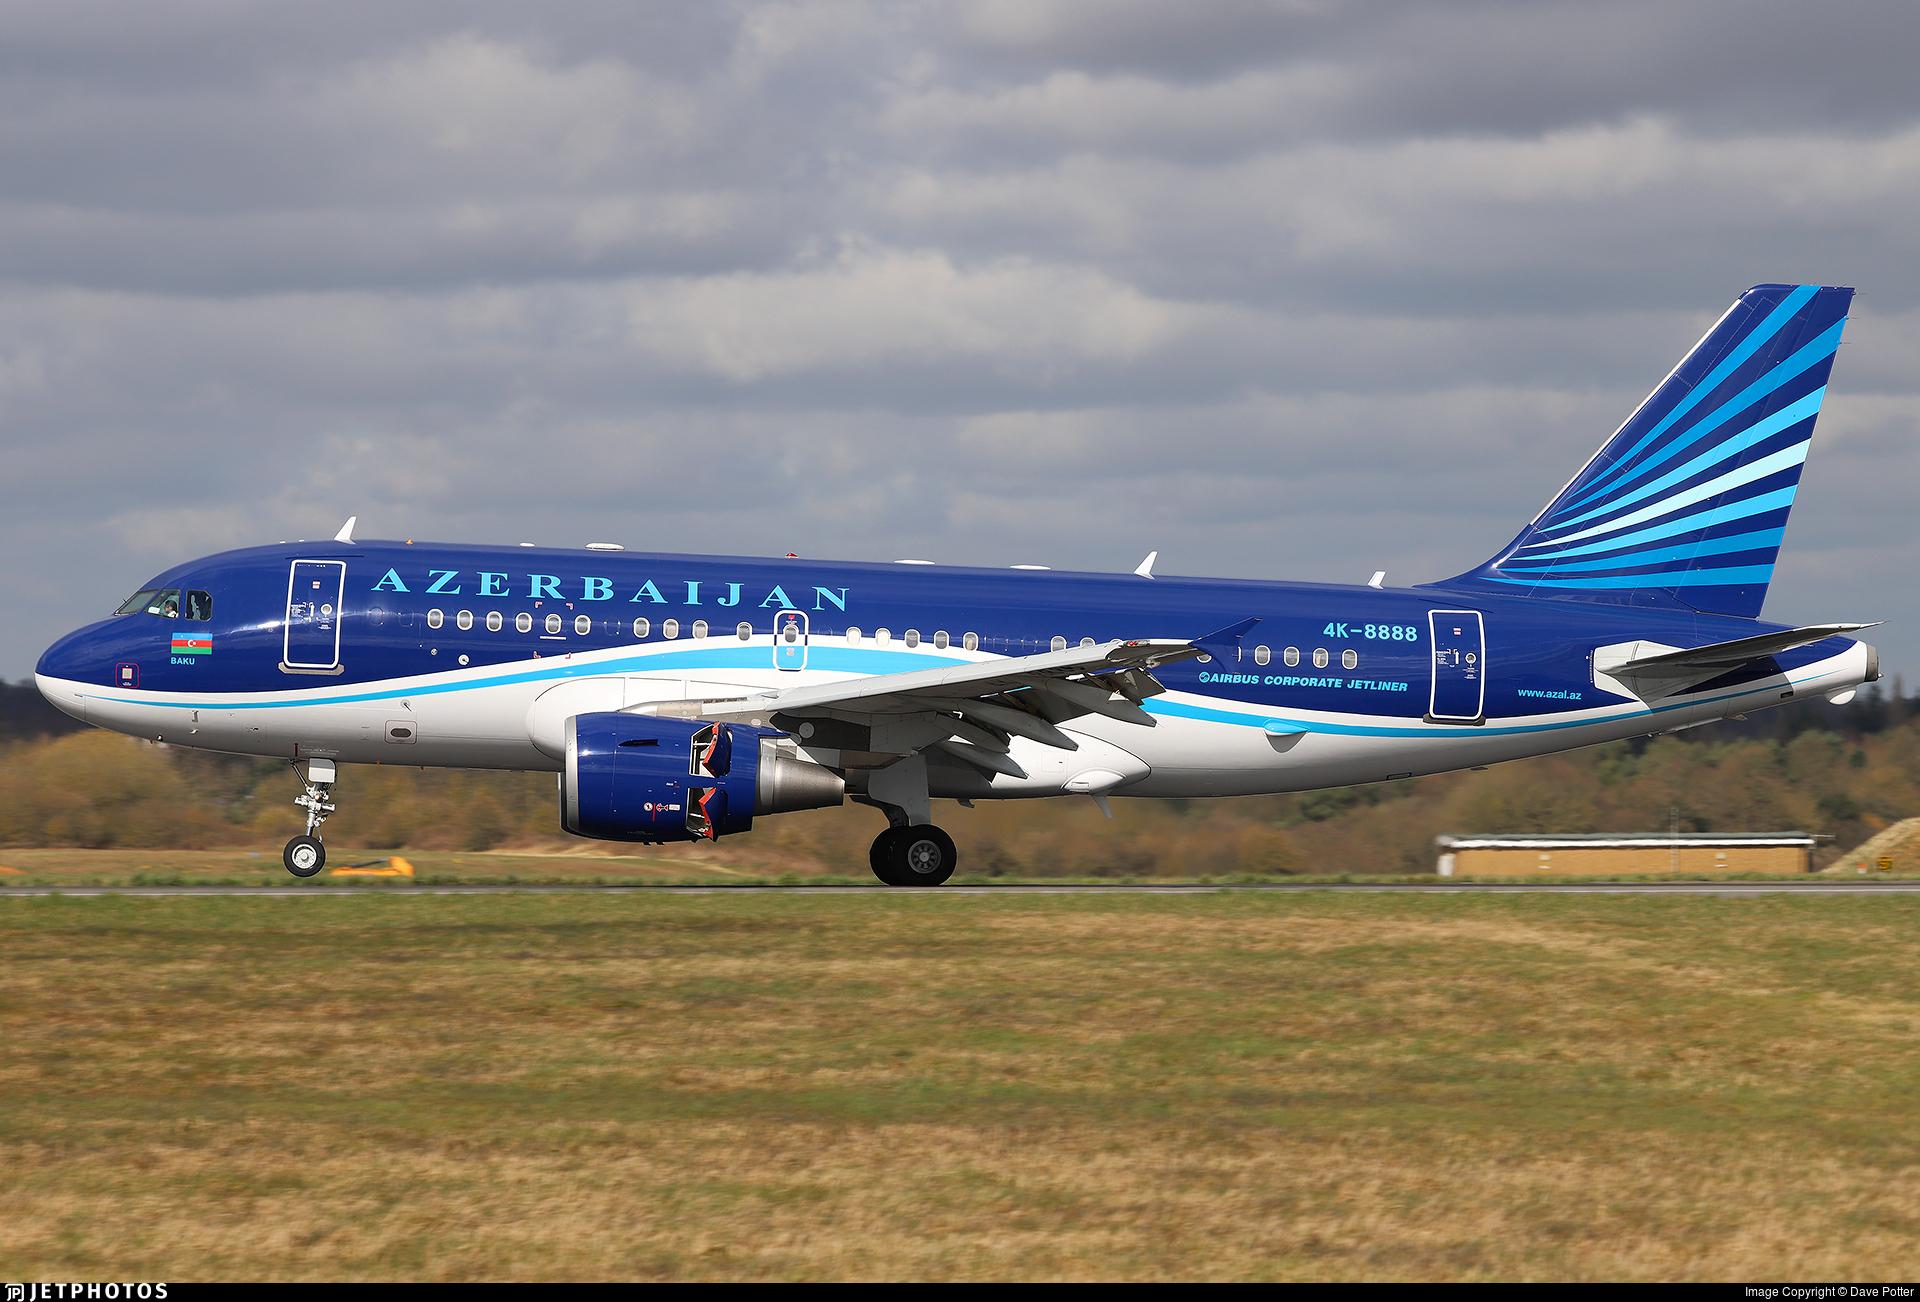 4K-8888 - Airbus A319-115X(CJ) - Azerbaijan - Government